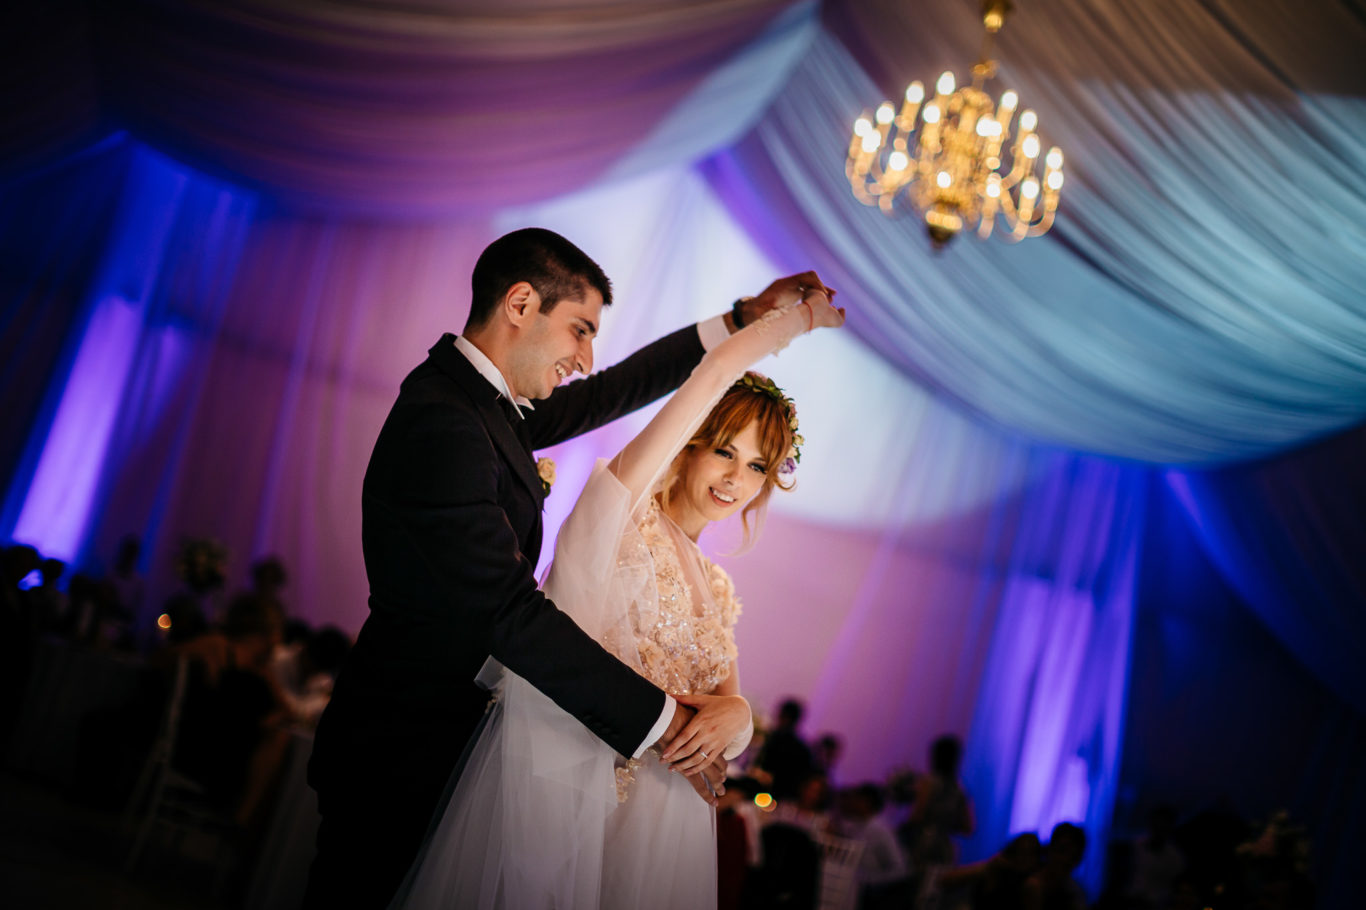 0501-Fotografie-nunta-Stirbey-Laura-Rares-fotograf-Ciprian-Dumitrescu-CDF_0675